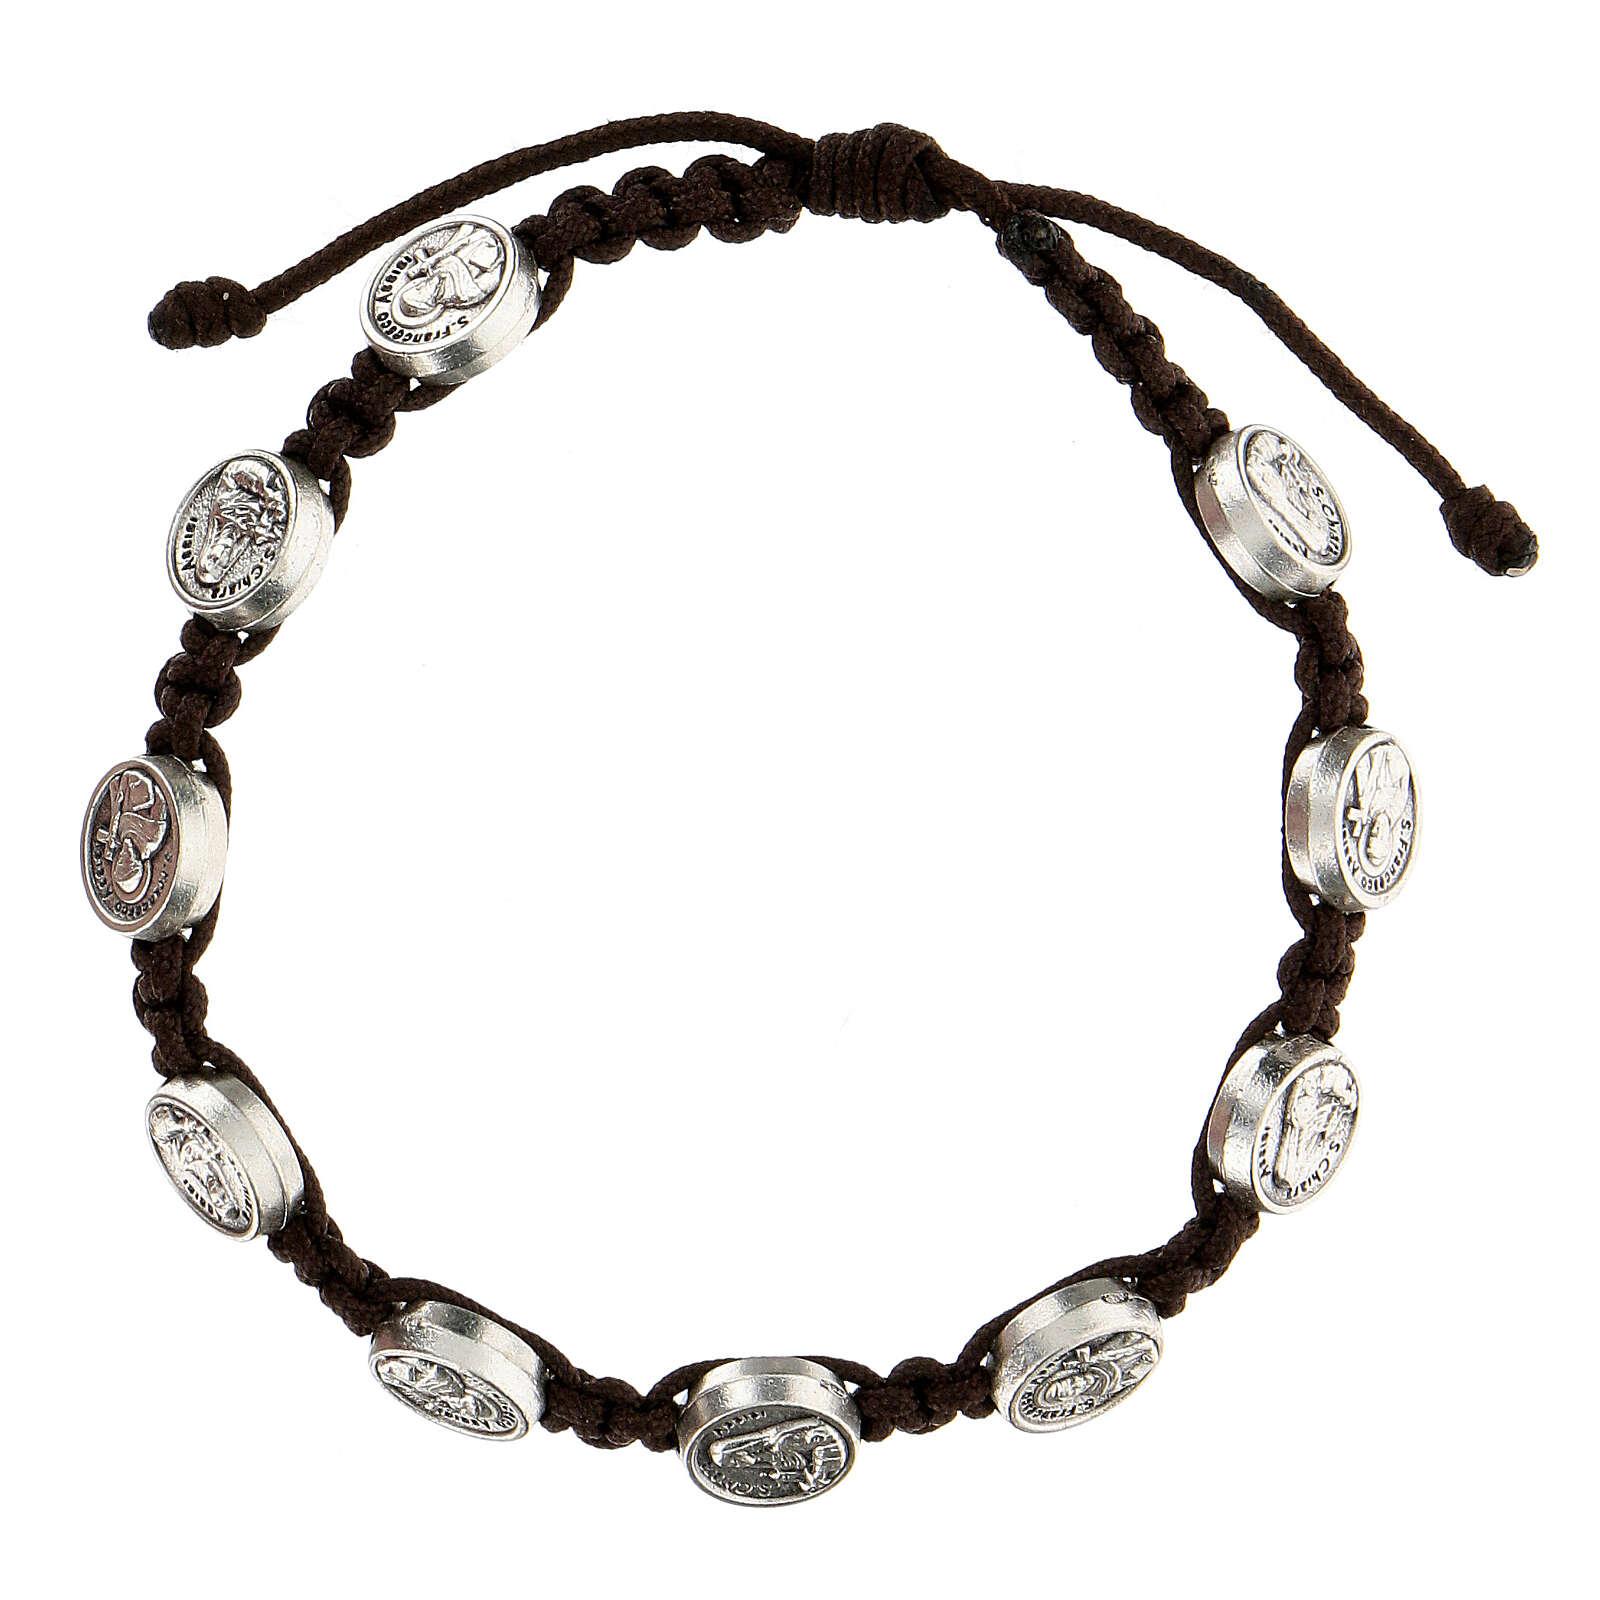 Medjugorje bracelet with brown string structure and metal medals  4